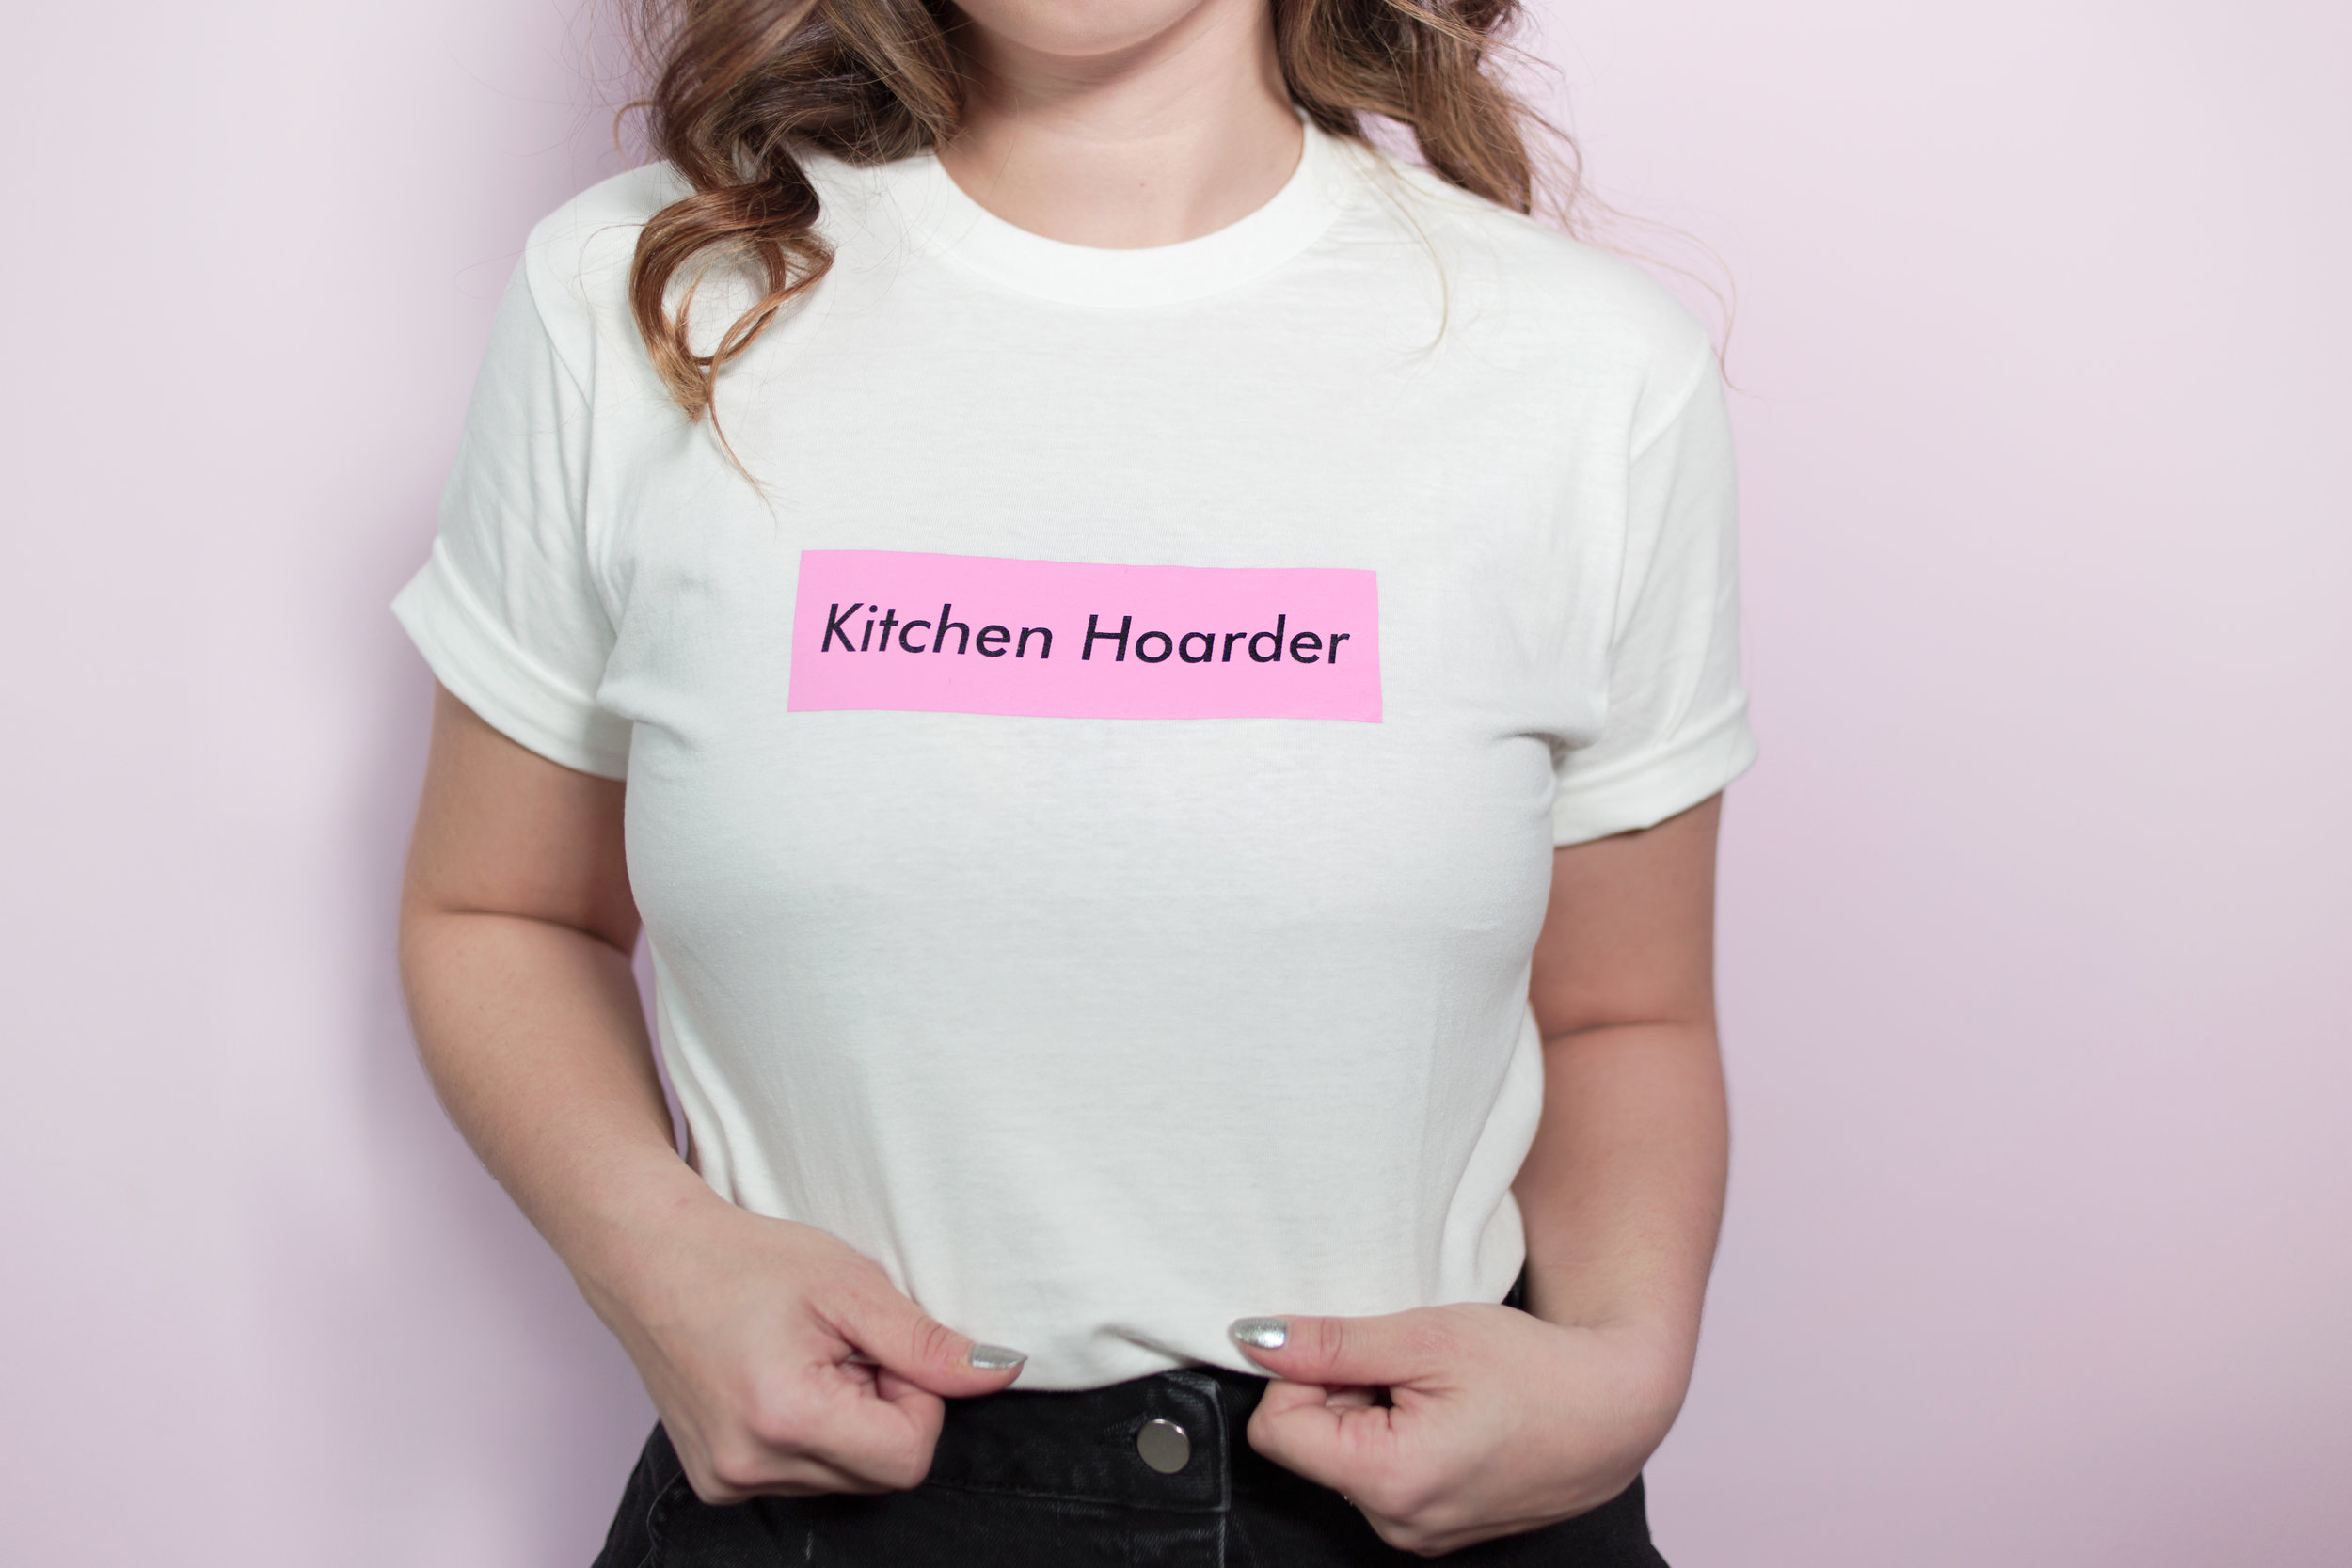 kitchenhoarder